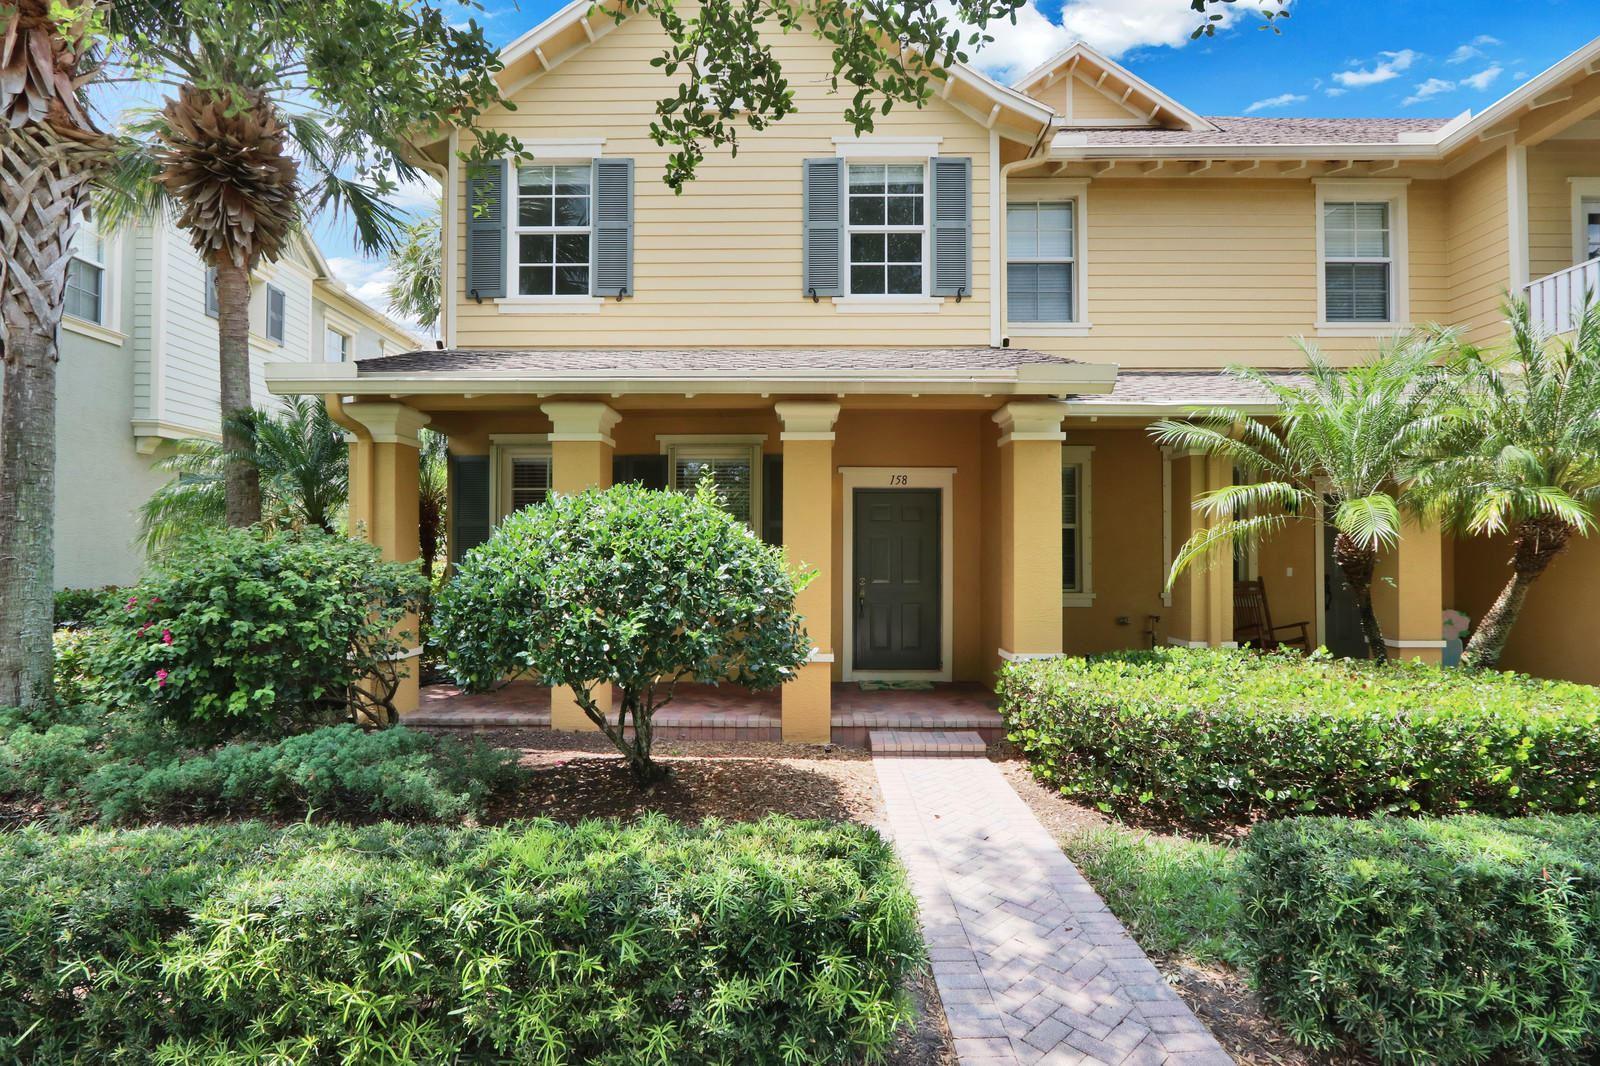 158 W Thatch Palm Circle, Jupiter, FL 33458 - MLS#: RX-10713477